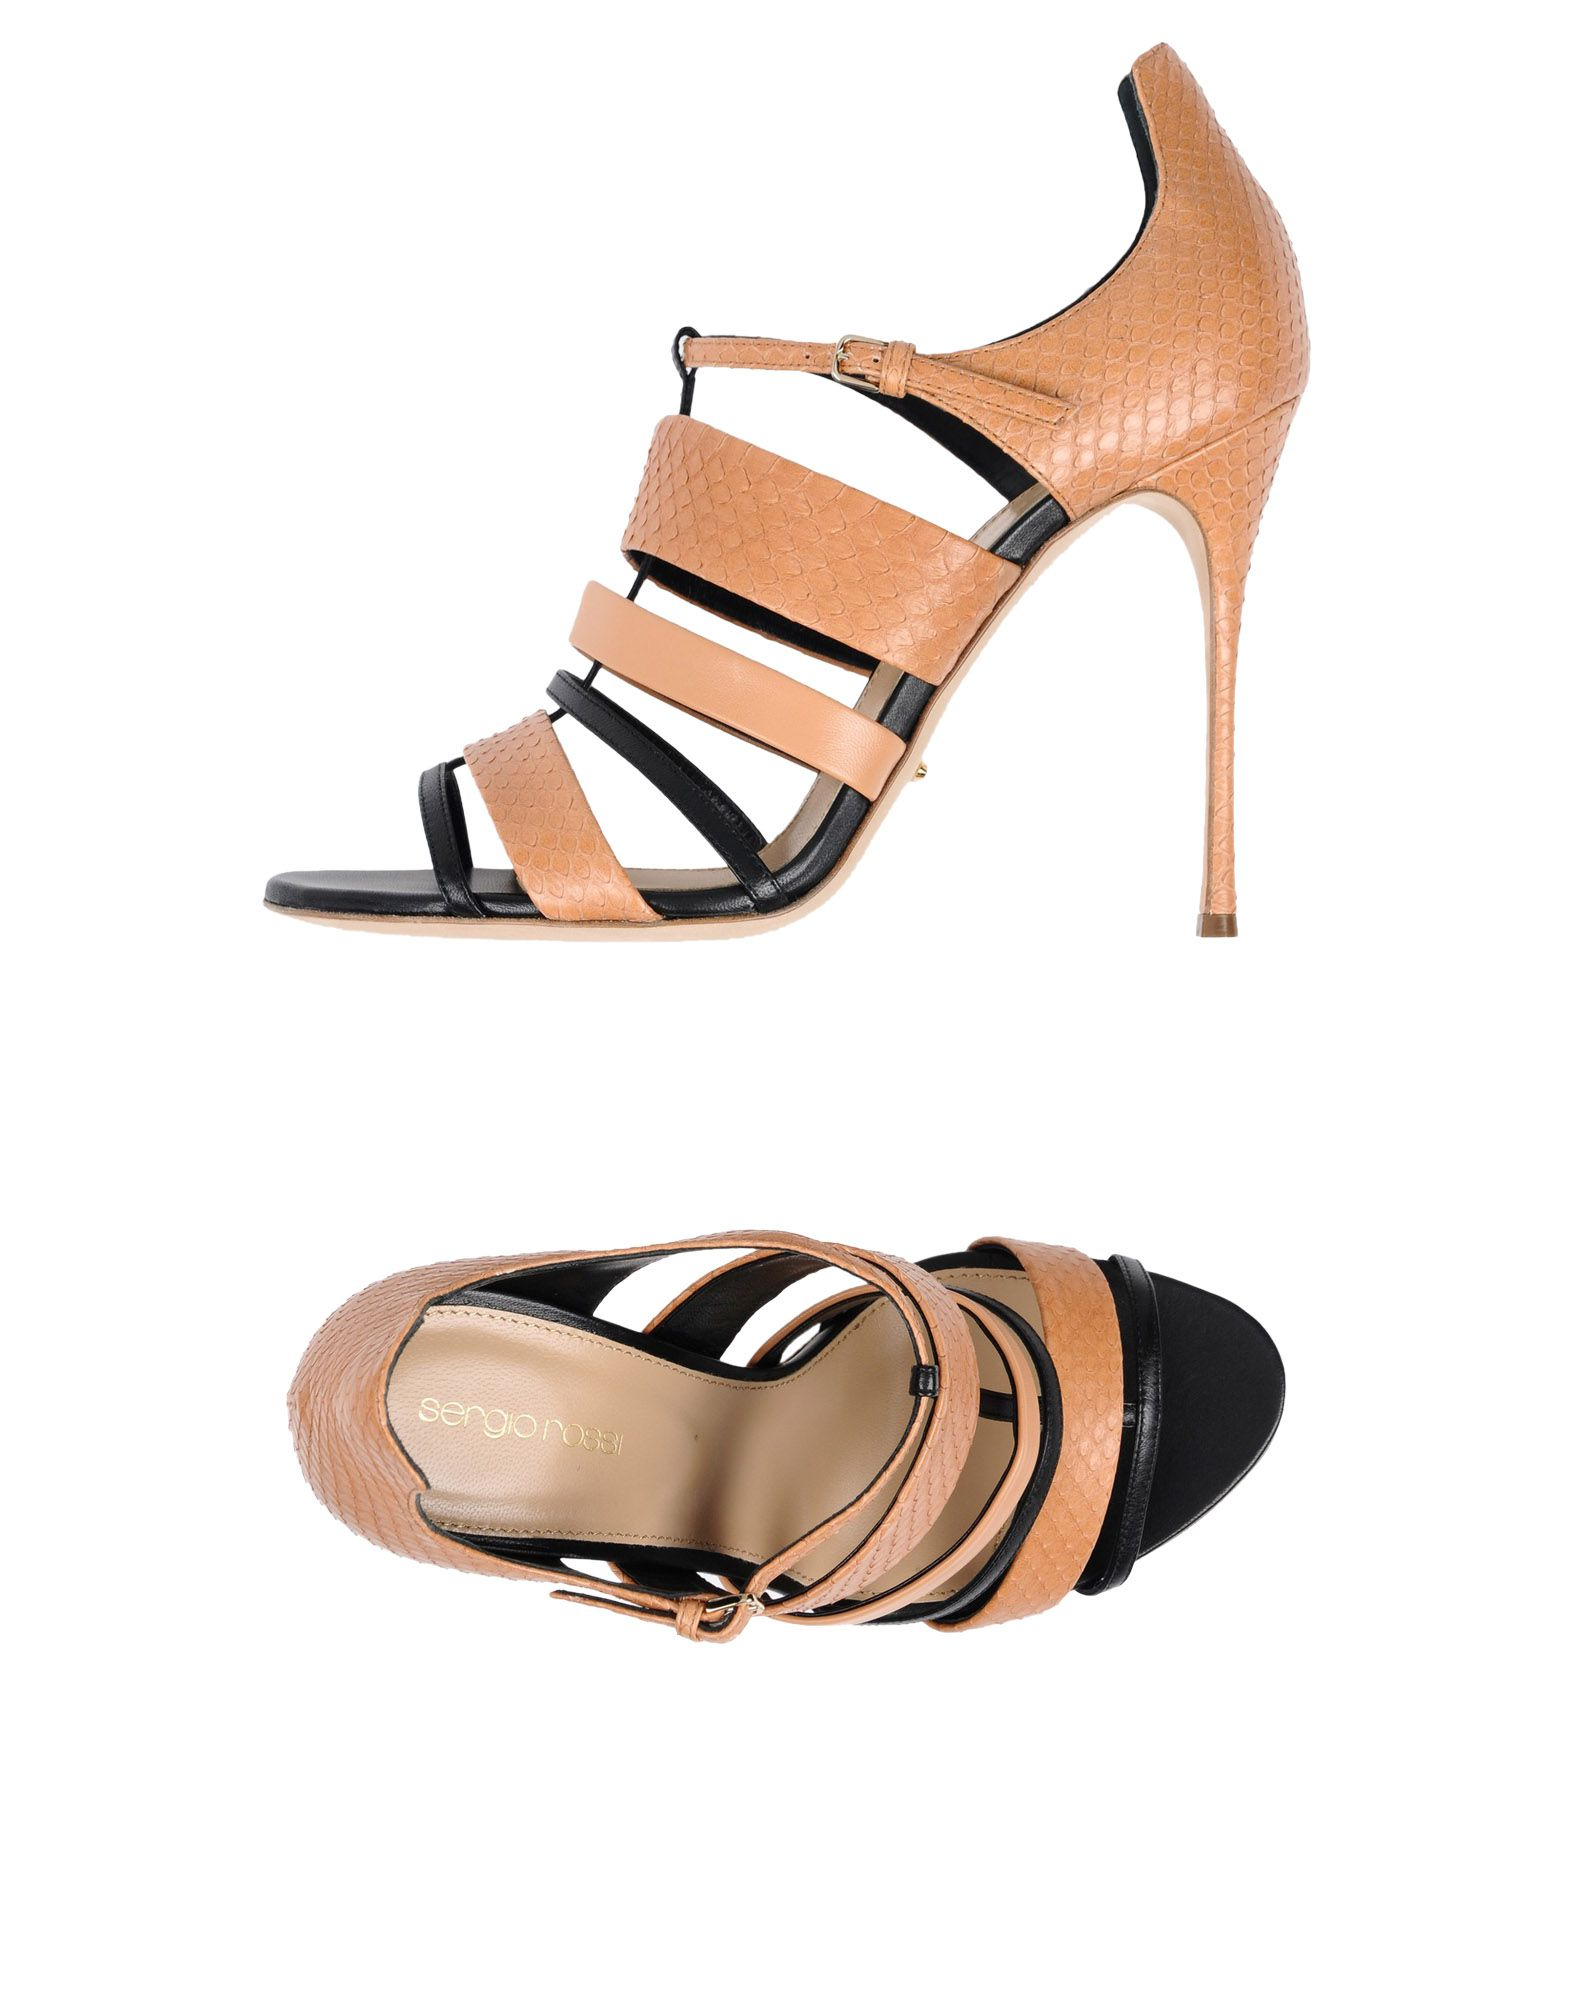 Sergio Rossi Sandalen Damen Schuhe  11433660LFGünstige gut aussehende Schuhe Damen 598b4a